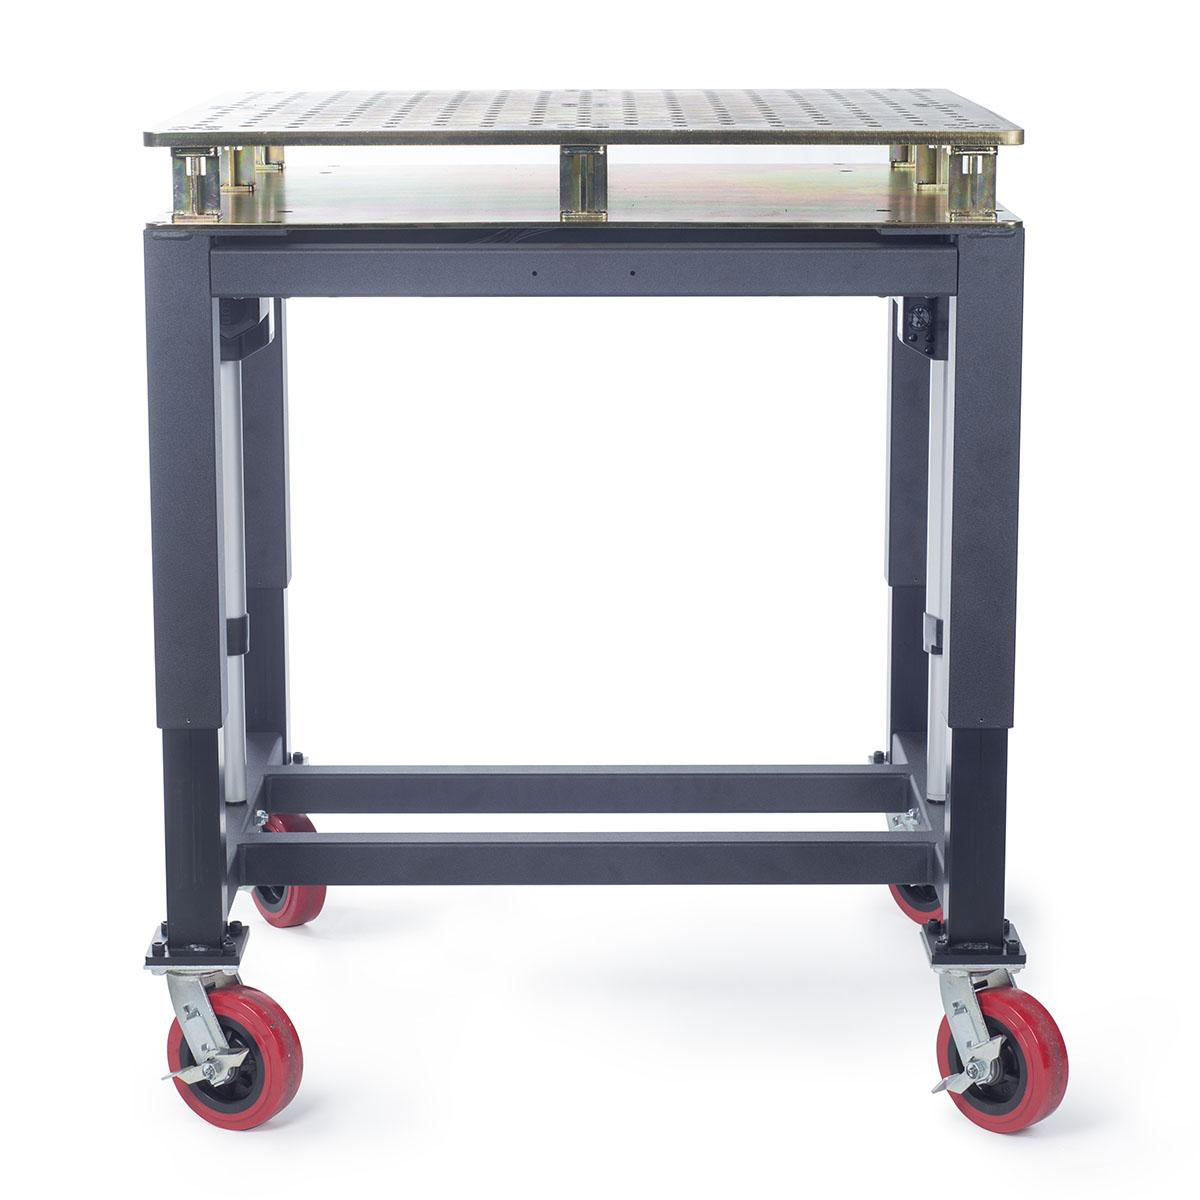 Height-adjustable welding table